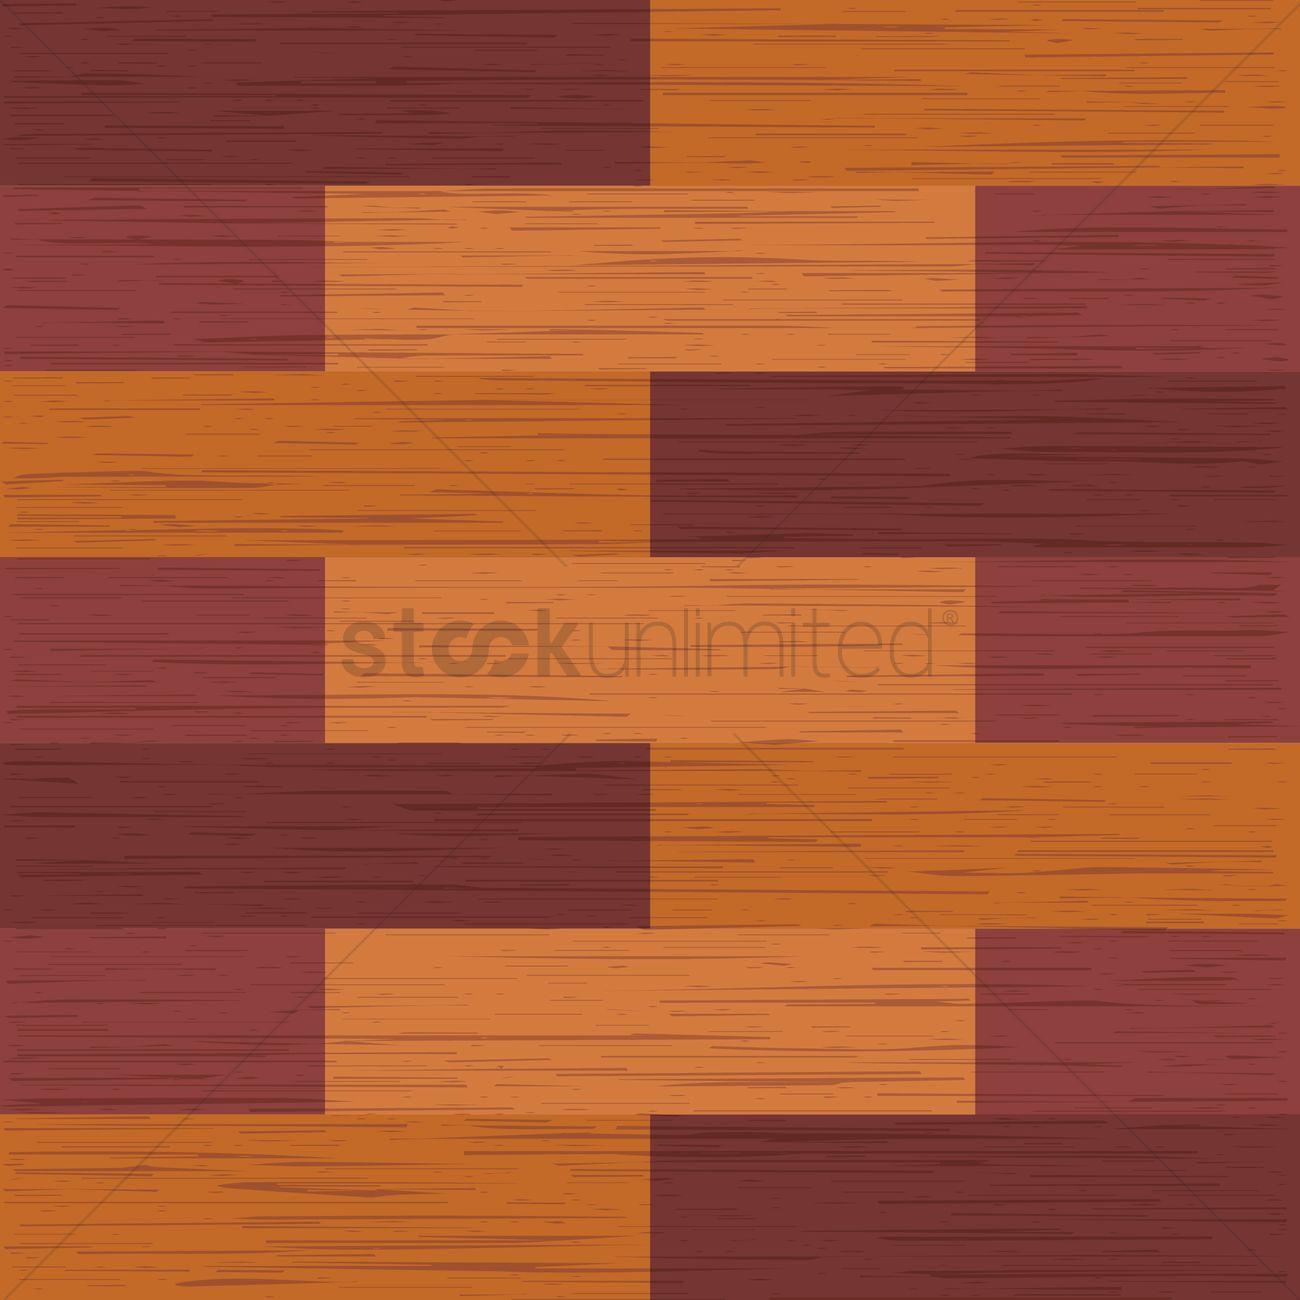 Wooden bricks texture Vector Image - 1430172 | StockUnlimited